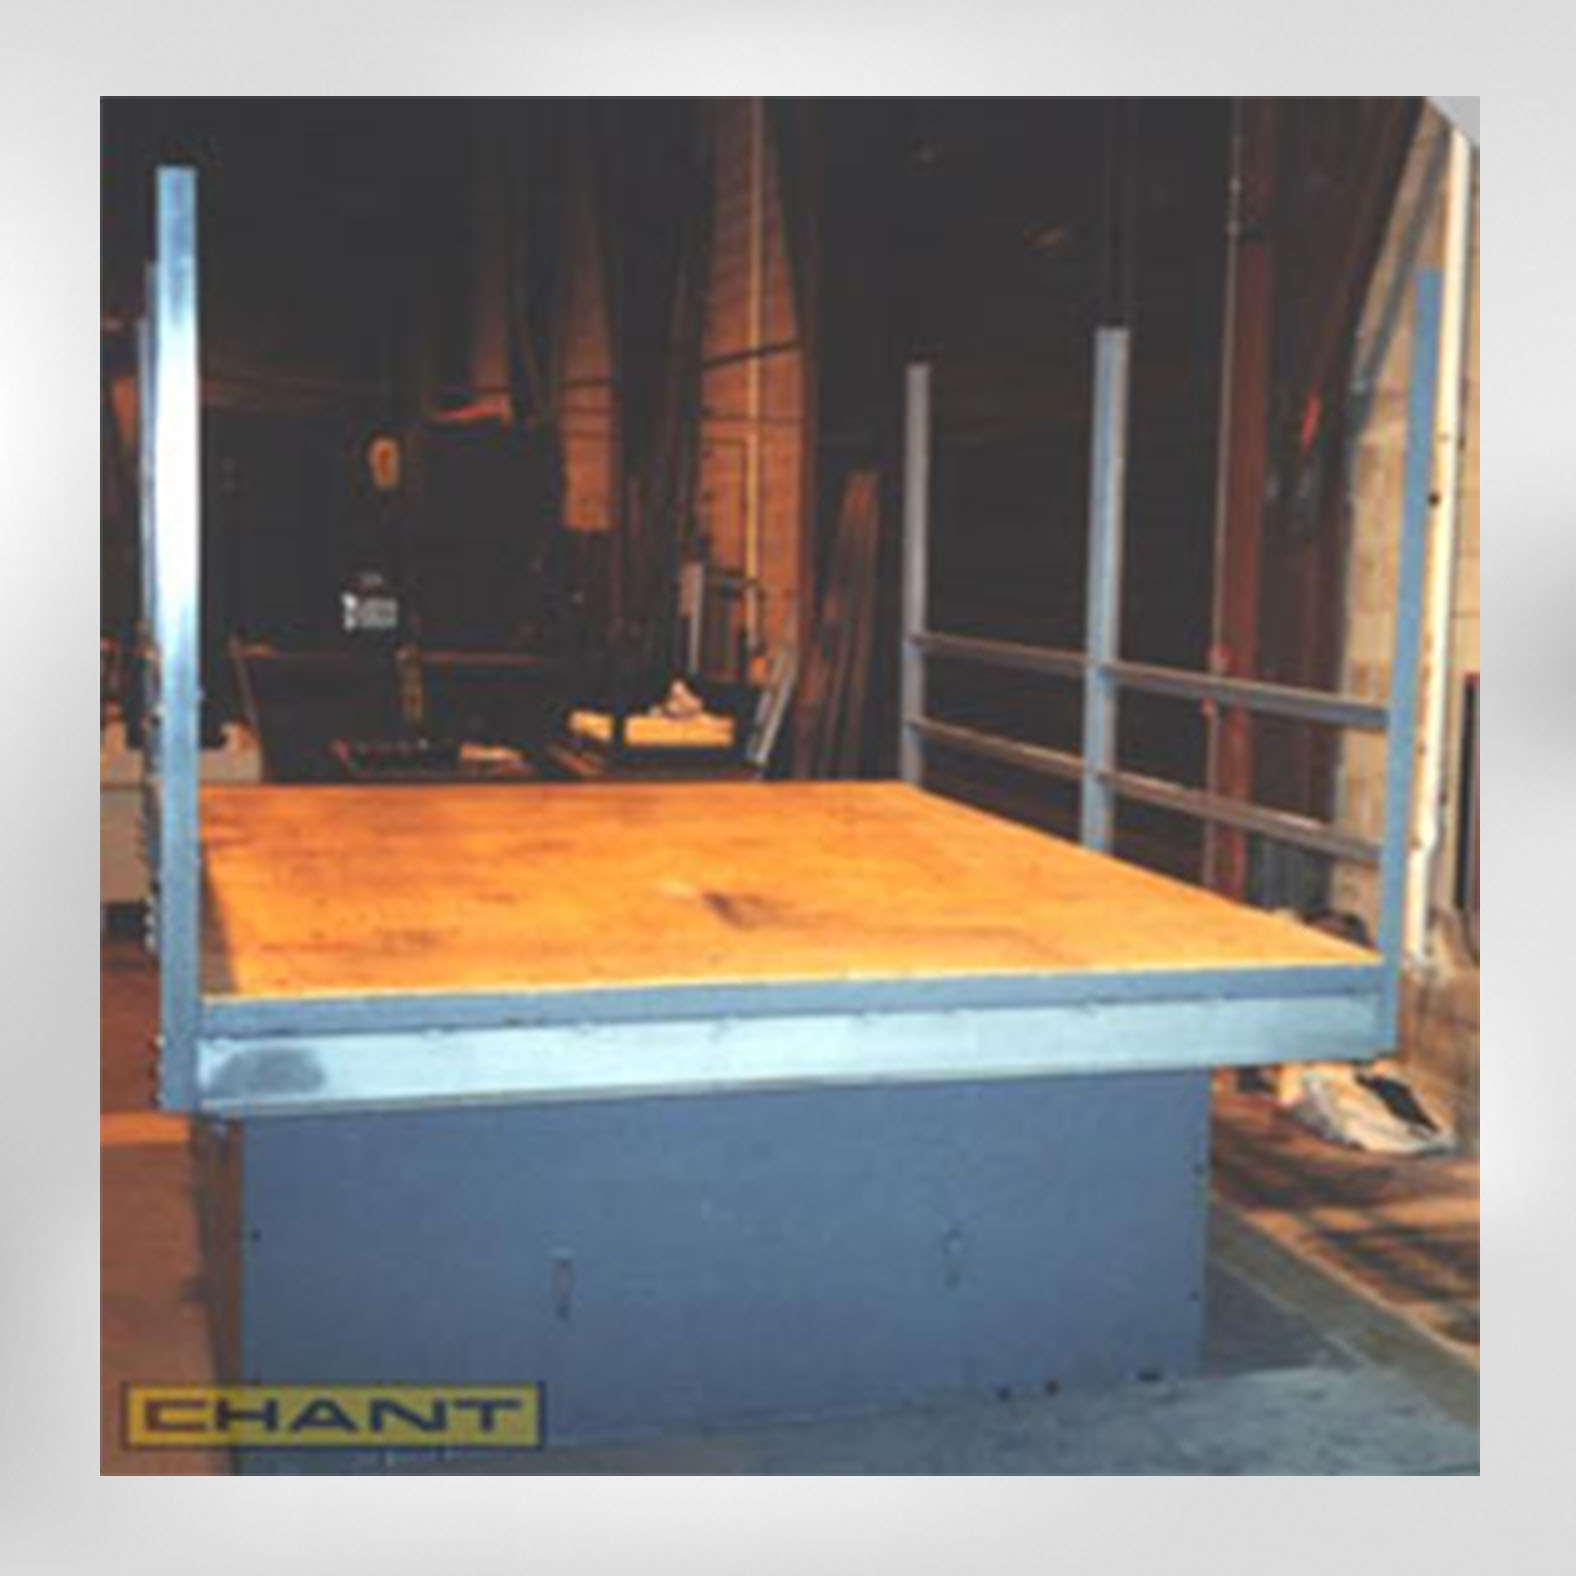 8760 Transportation Shaker Table Simulator